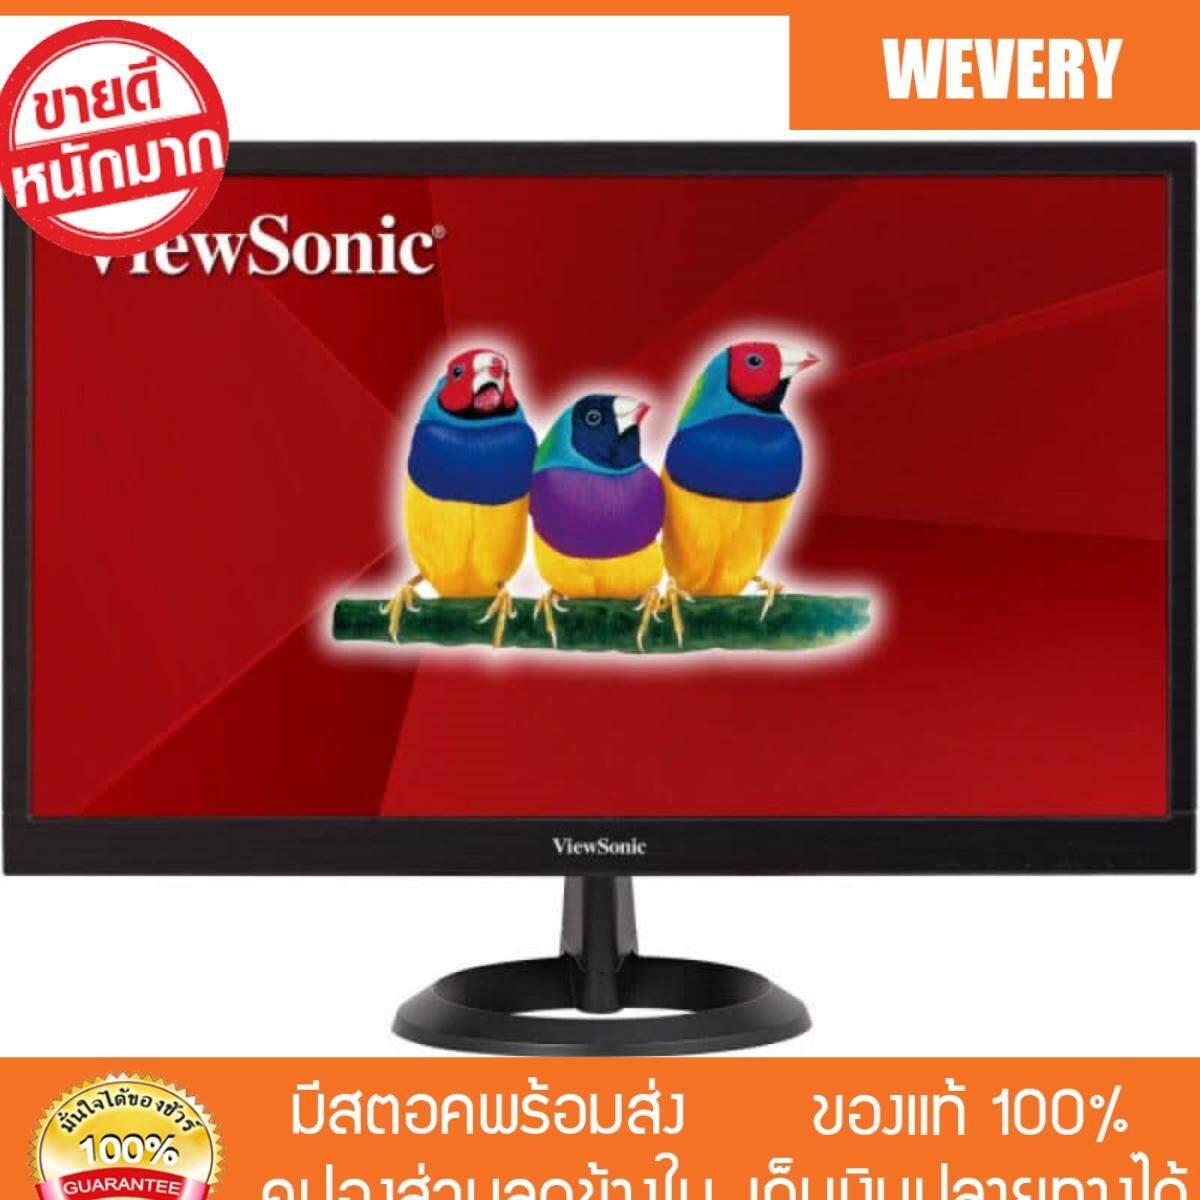 [Wevery] VIEWSONIC monitor LED V-VA2261-6 (HDMI) ขนาด 21.5 นิ้ว จอคอม จอคอมพิวเตอร์ จอมอนิเตอร์ viewsonic monitor ส่ง Kerry เก็บปลายทางได้